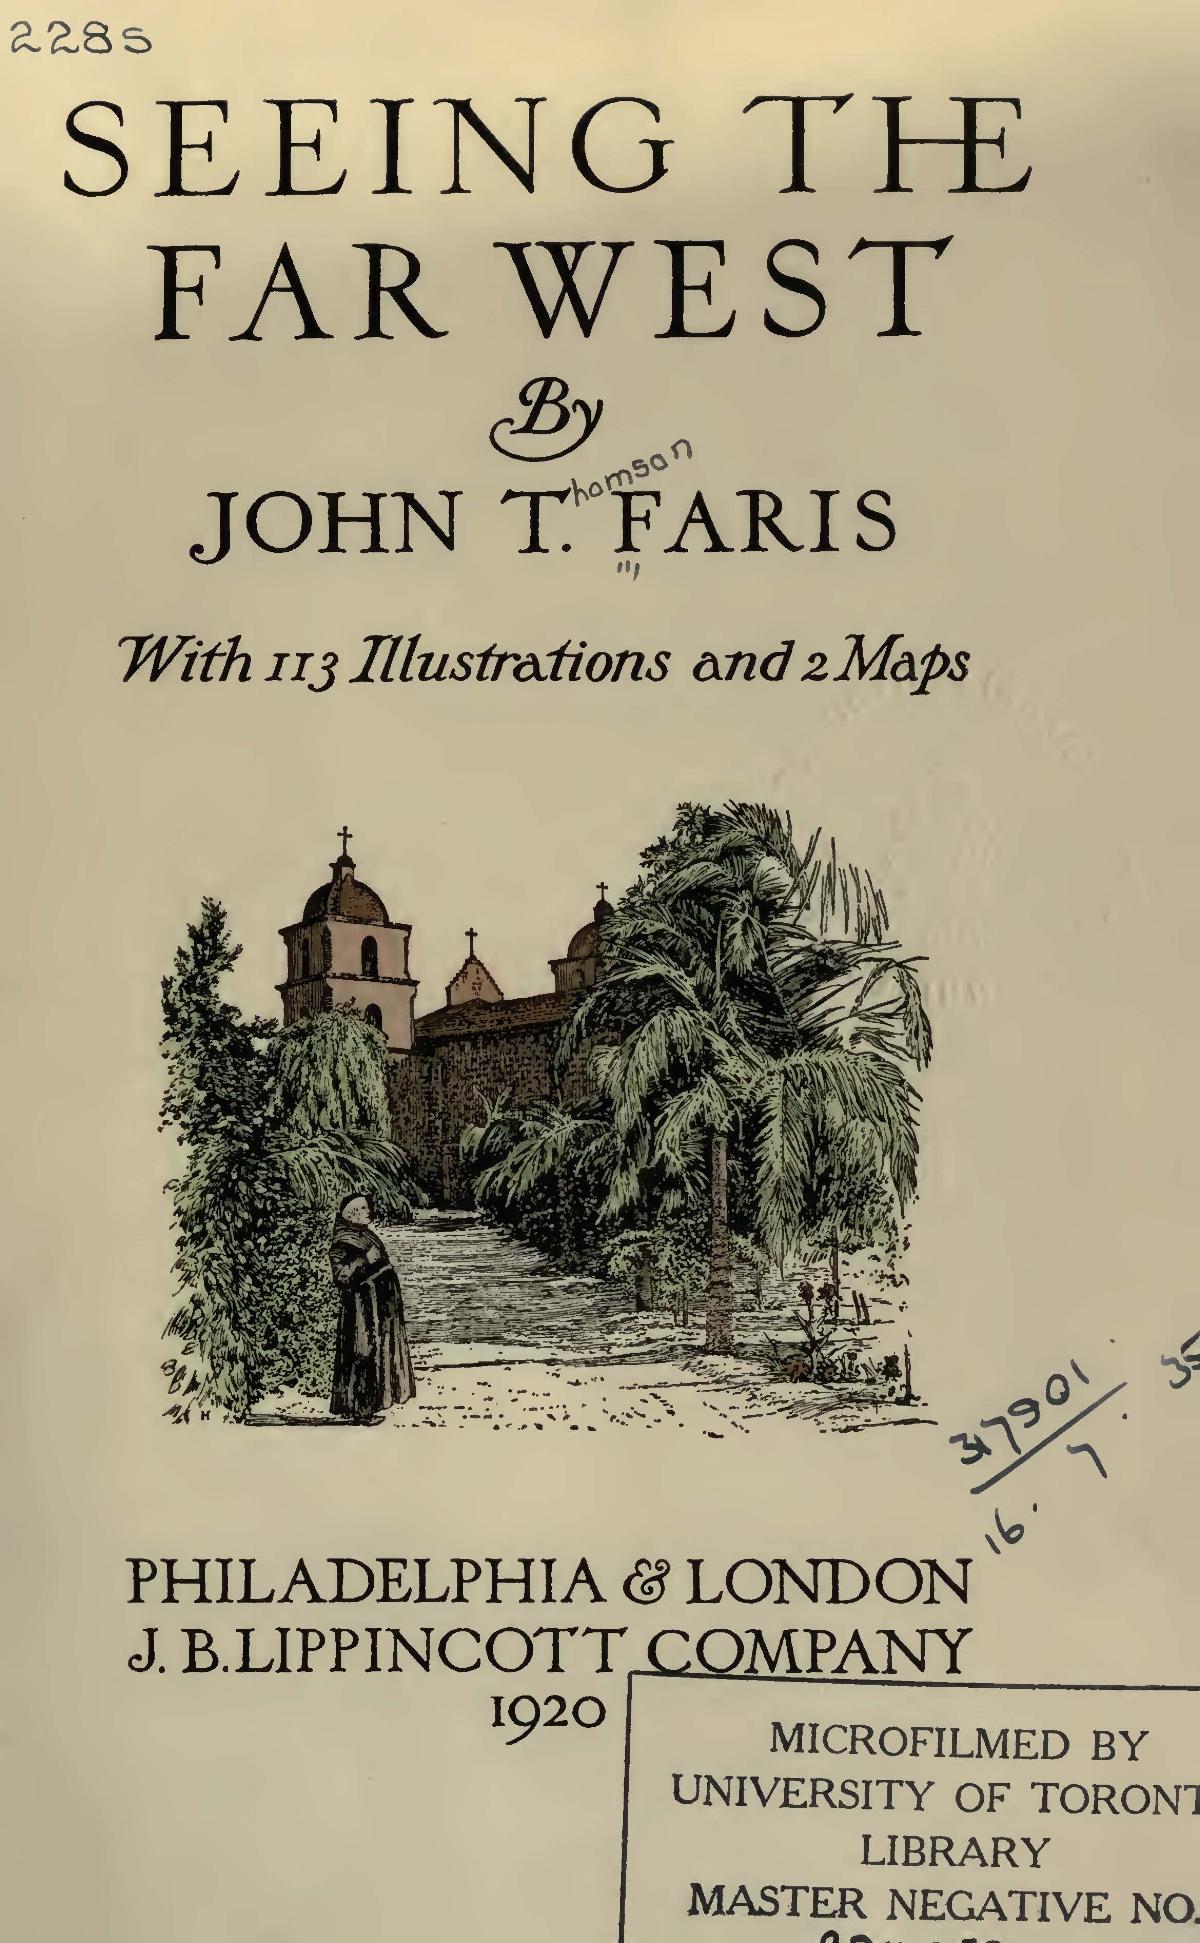 Faris, John Thomson, Seeing the Far West Title Page.jpg